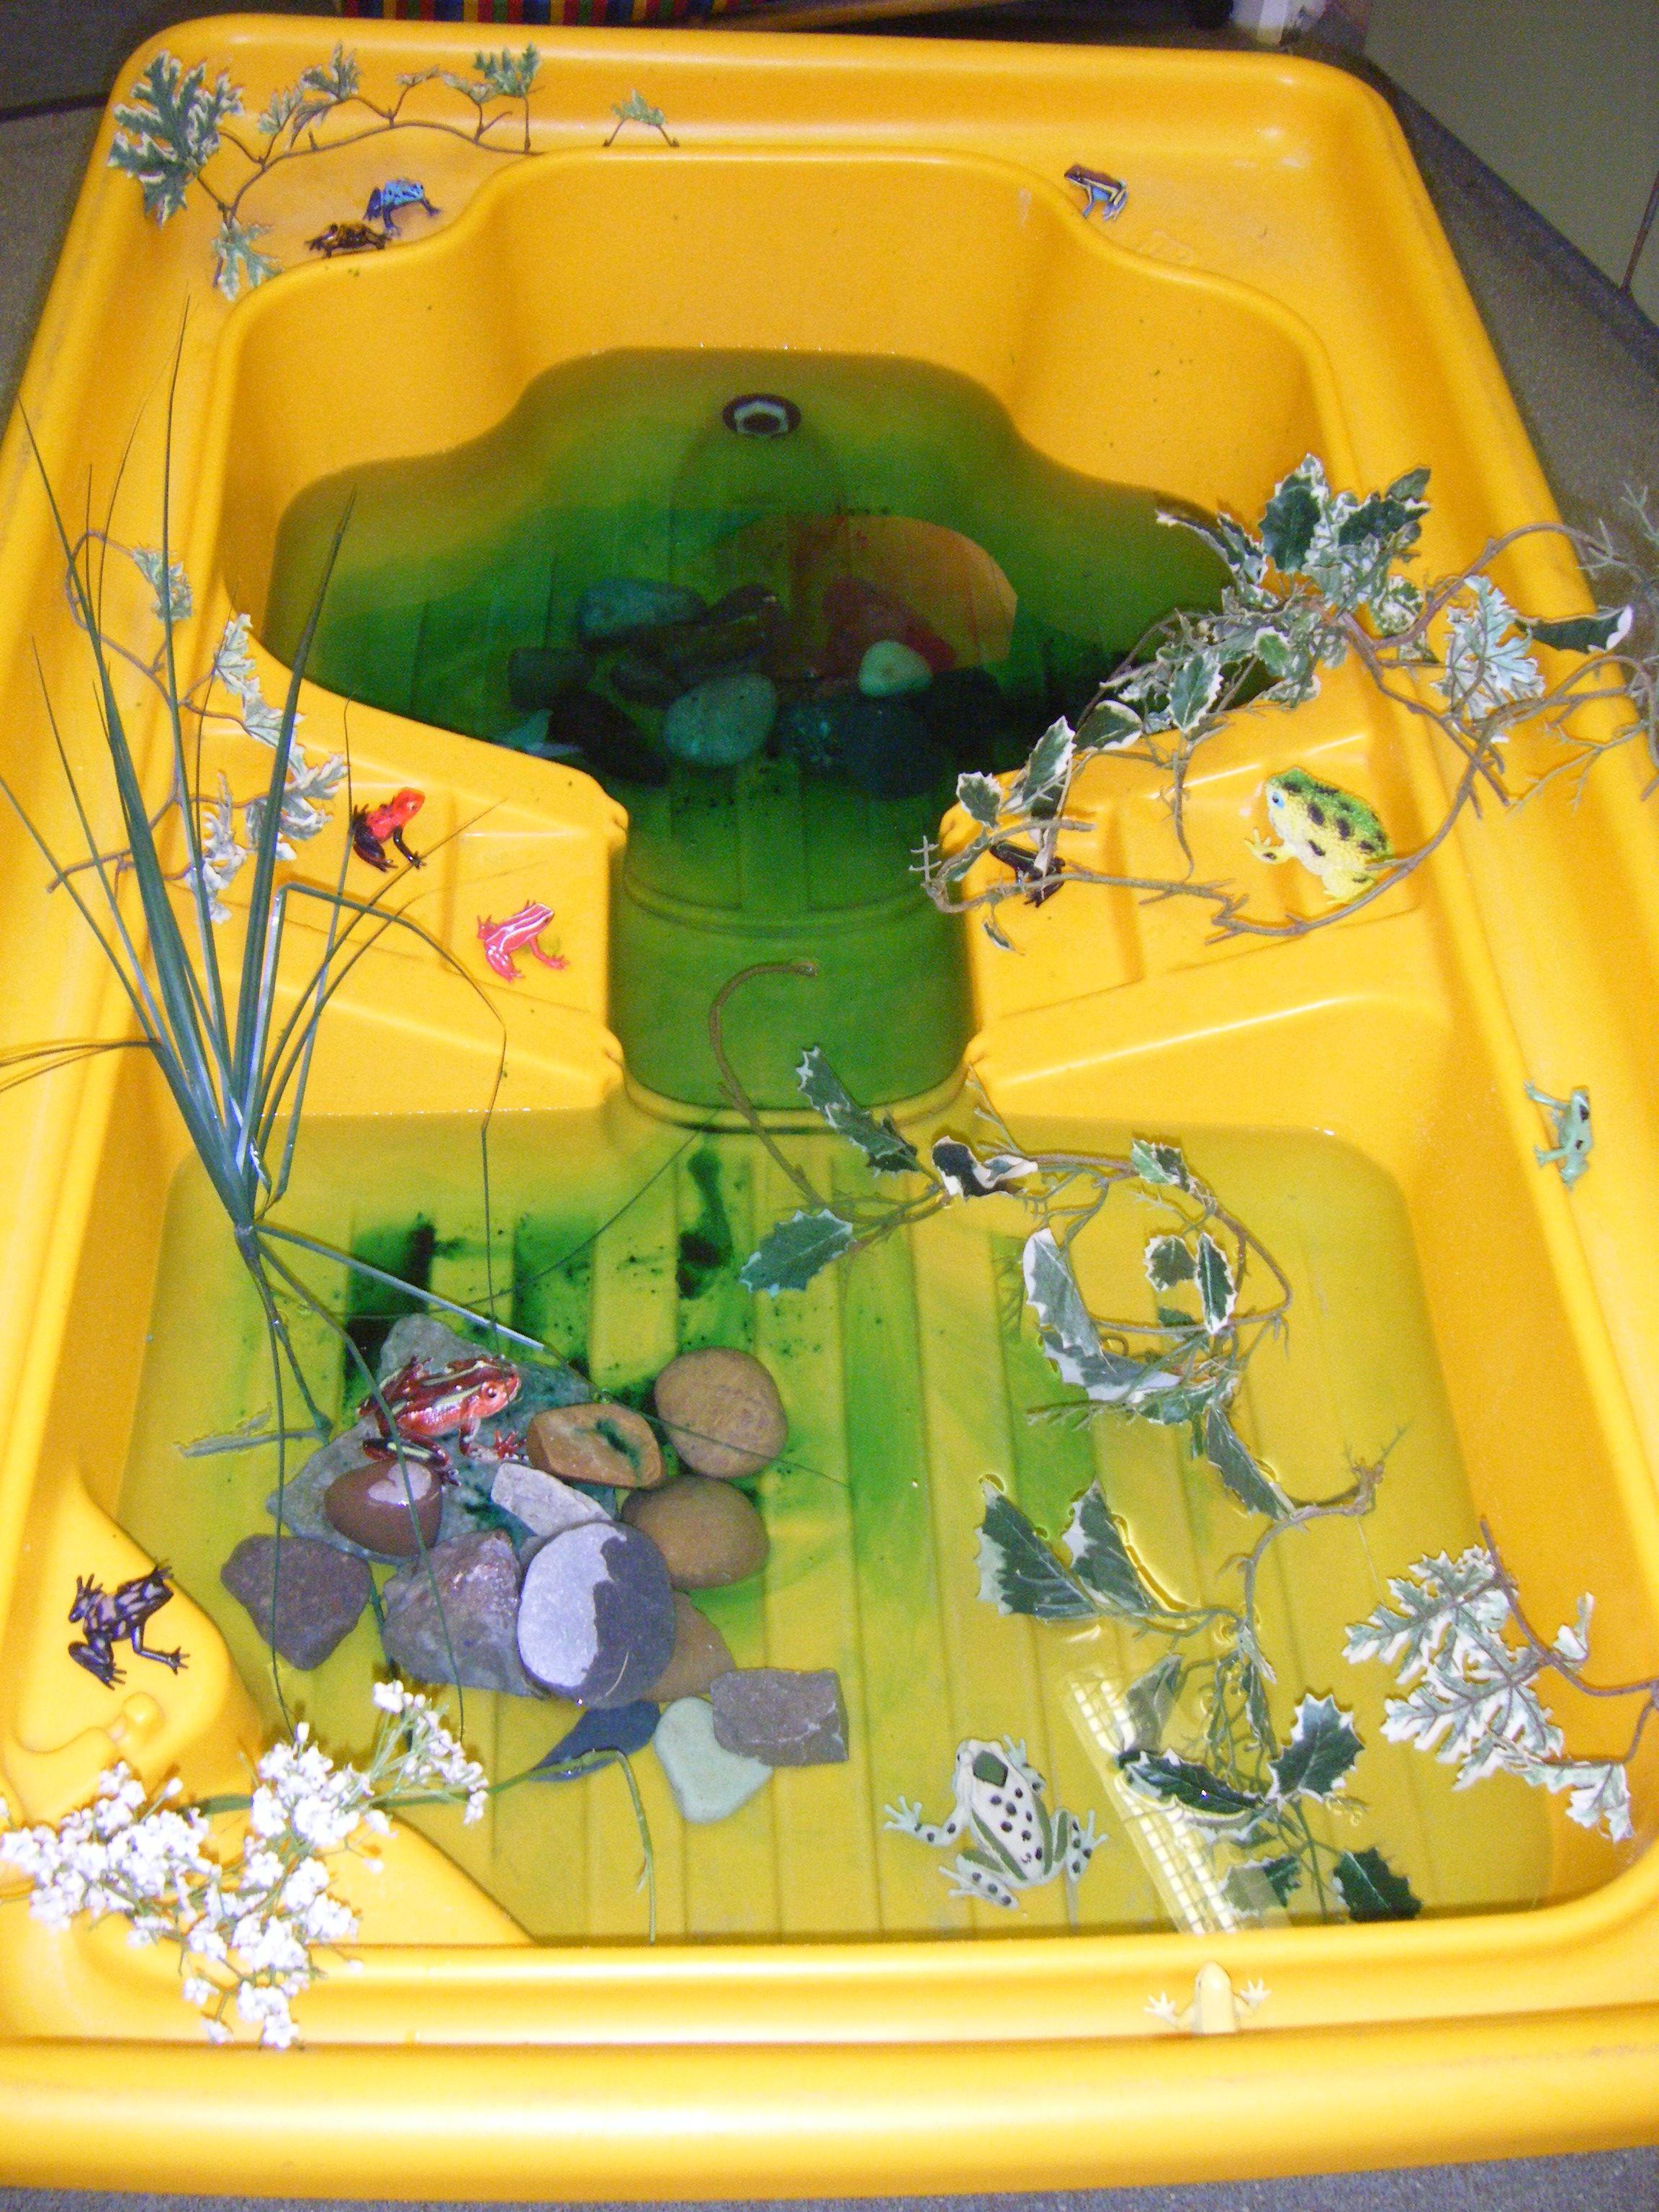 Pond Small World